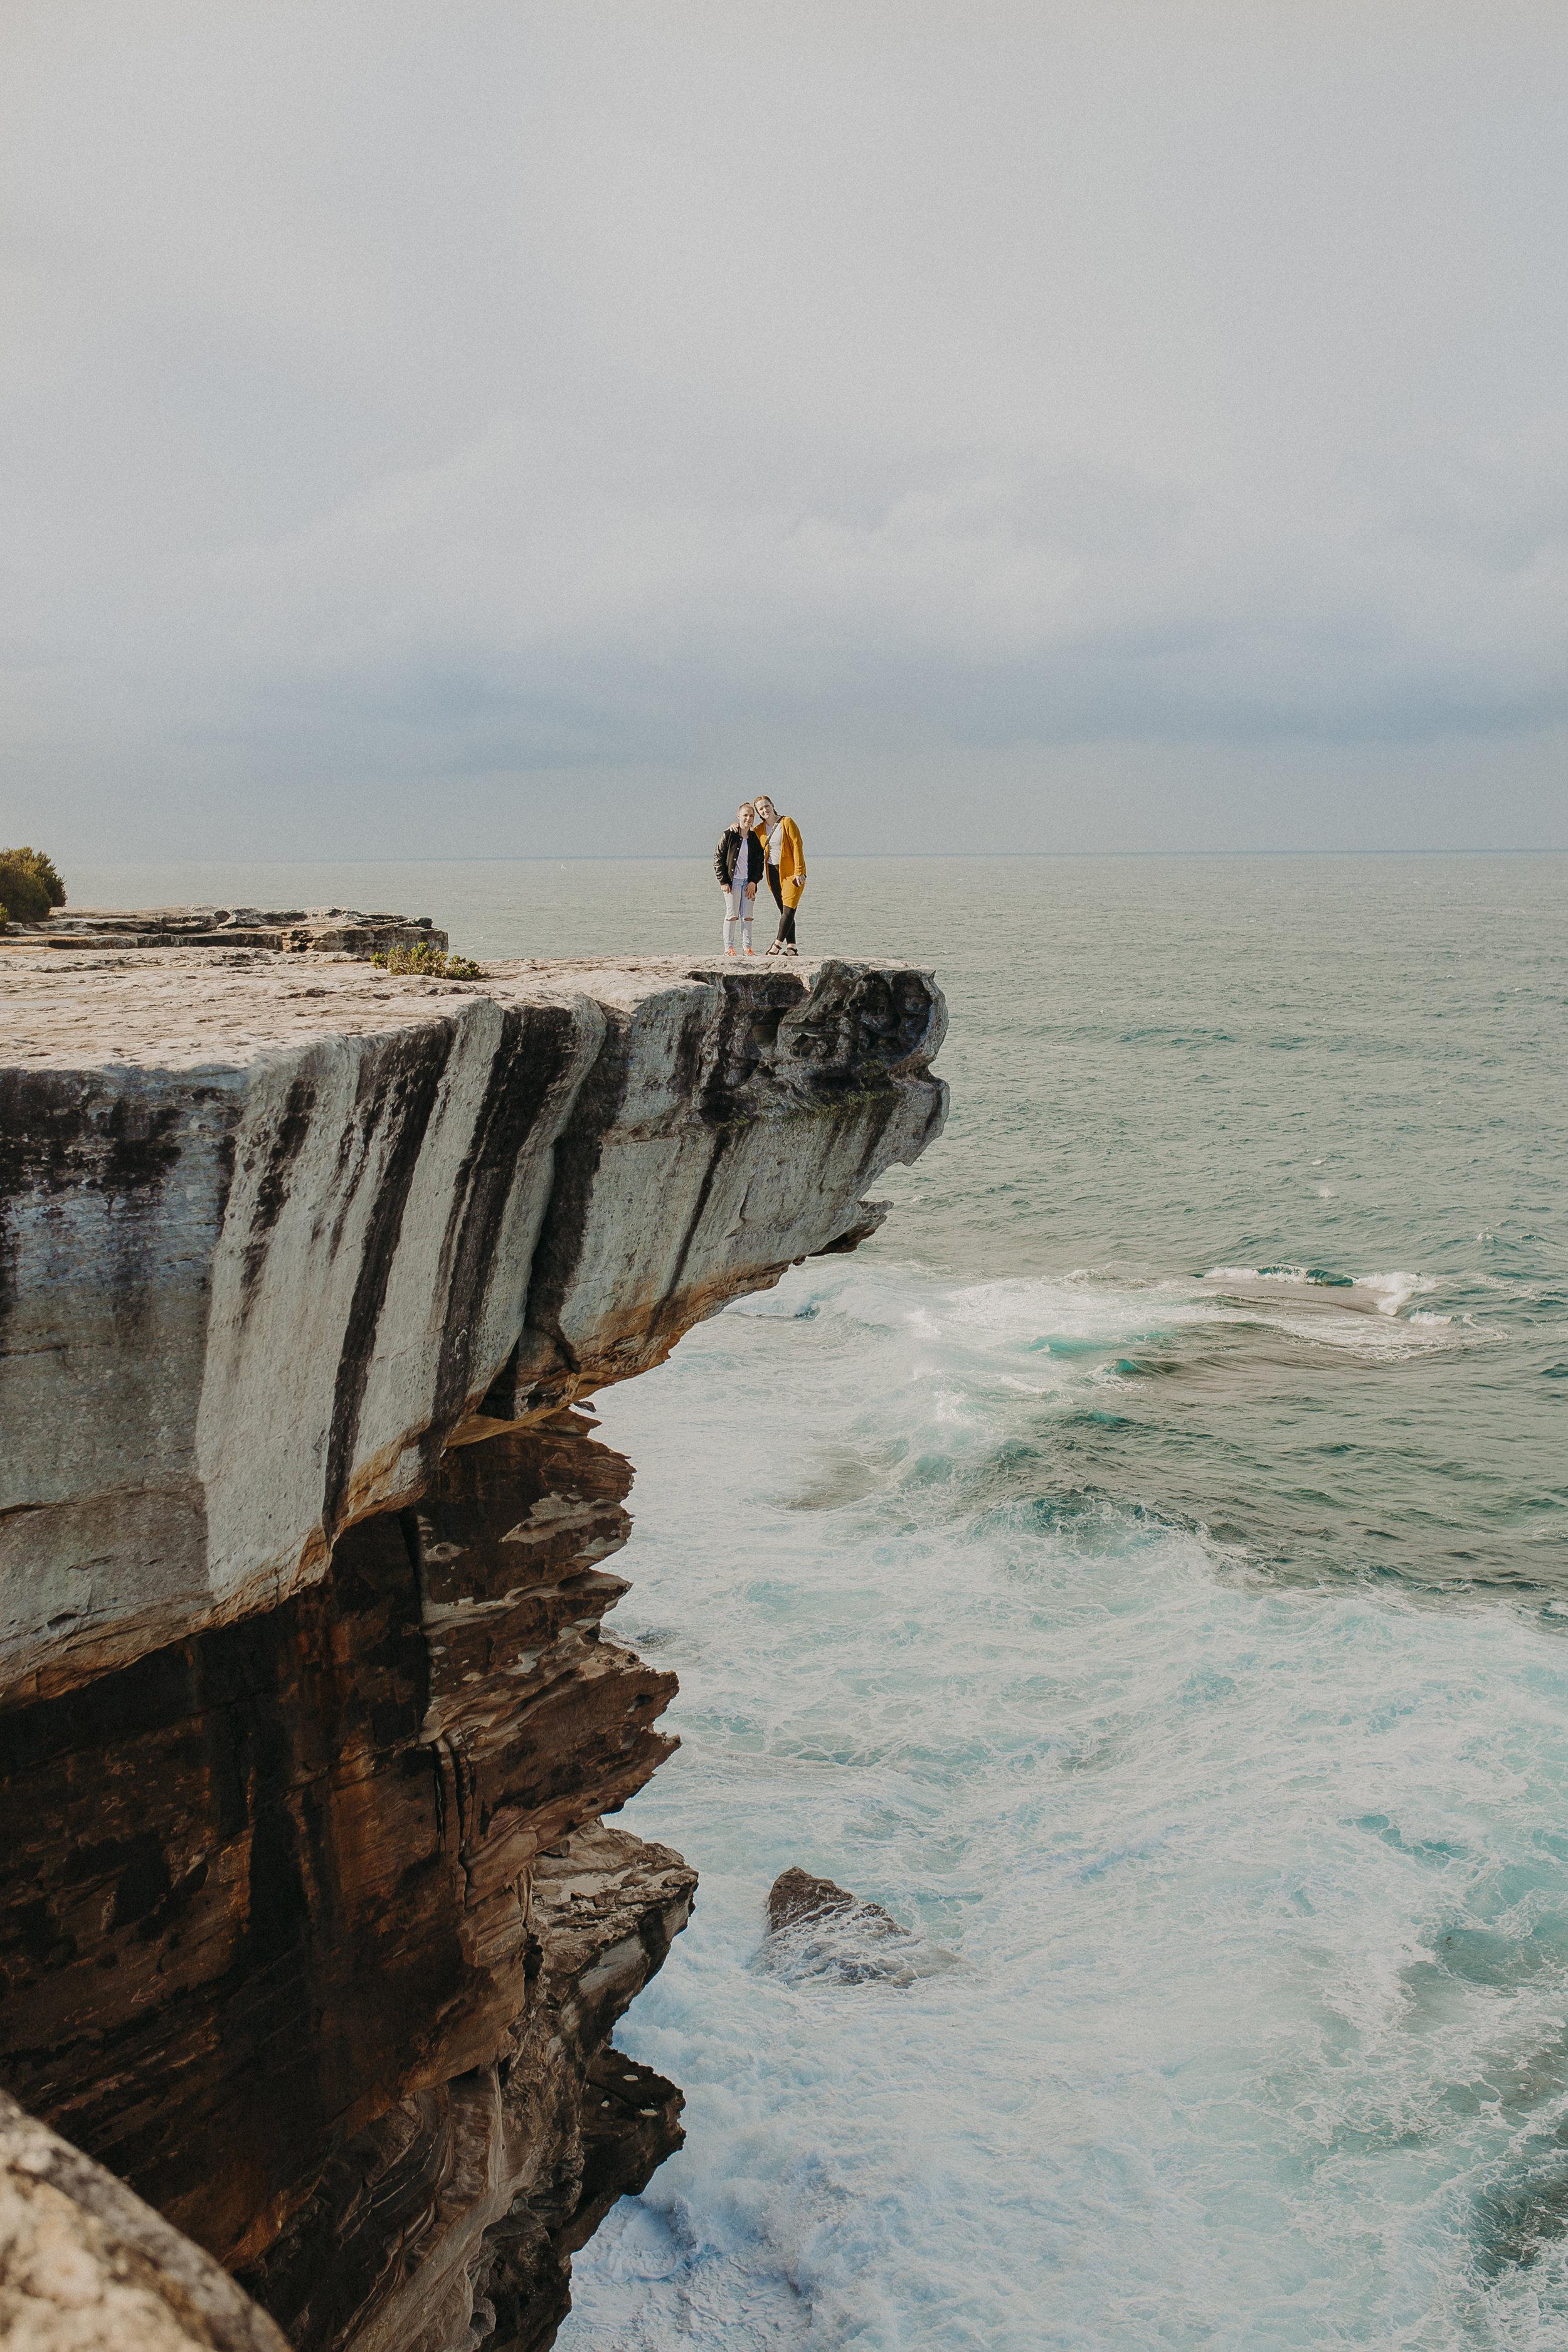 royal-national-park-australia-5.jpg